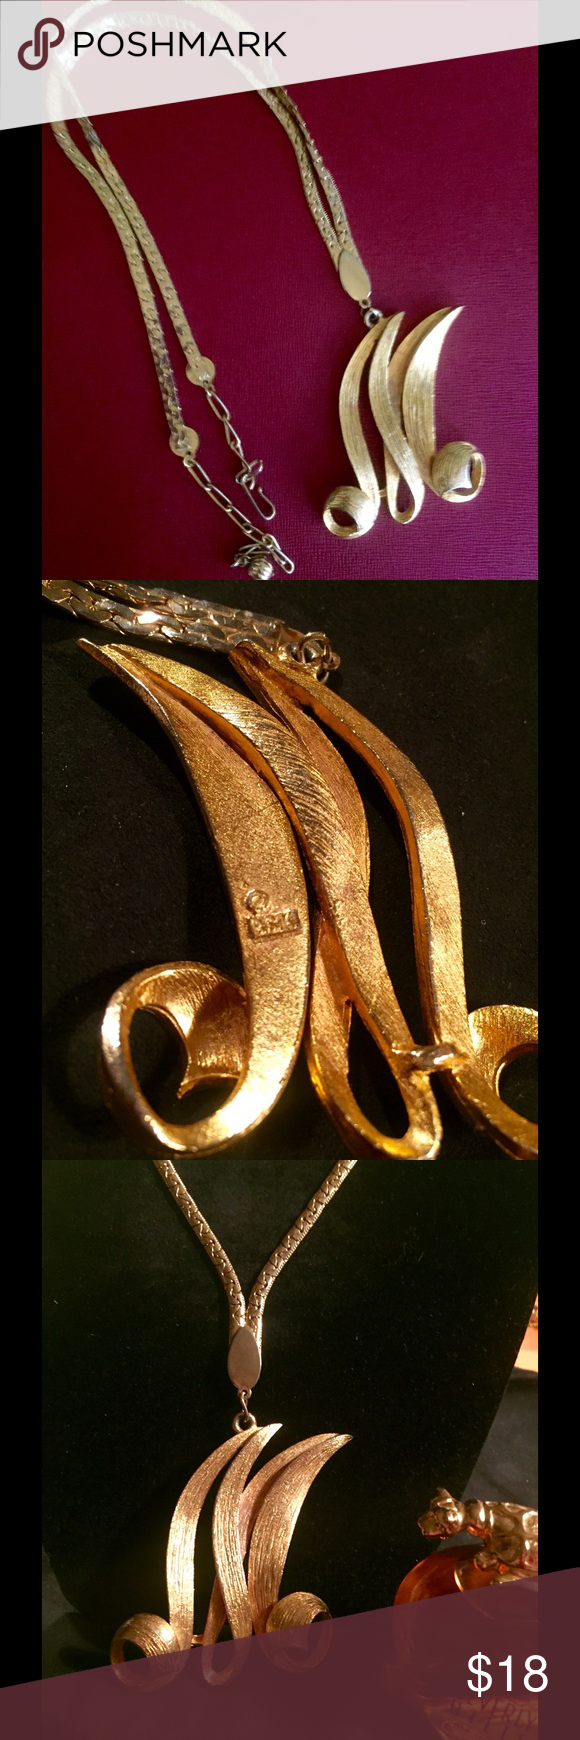 Reduced More Vintage Drop Necklace Flower Design with Tassels